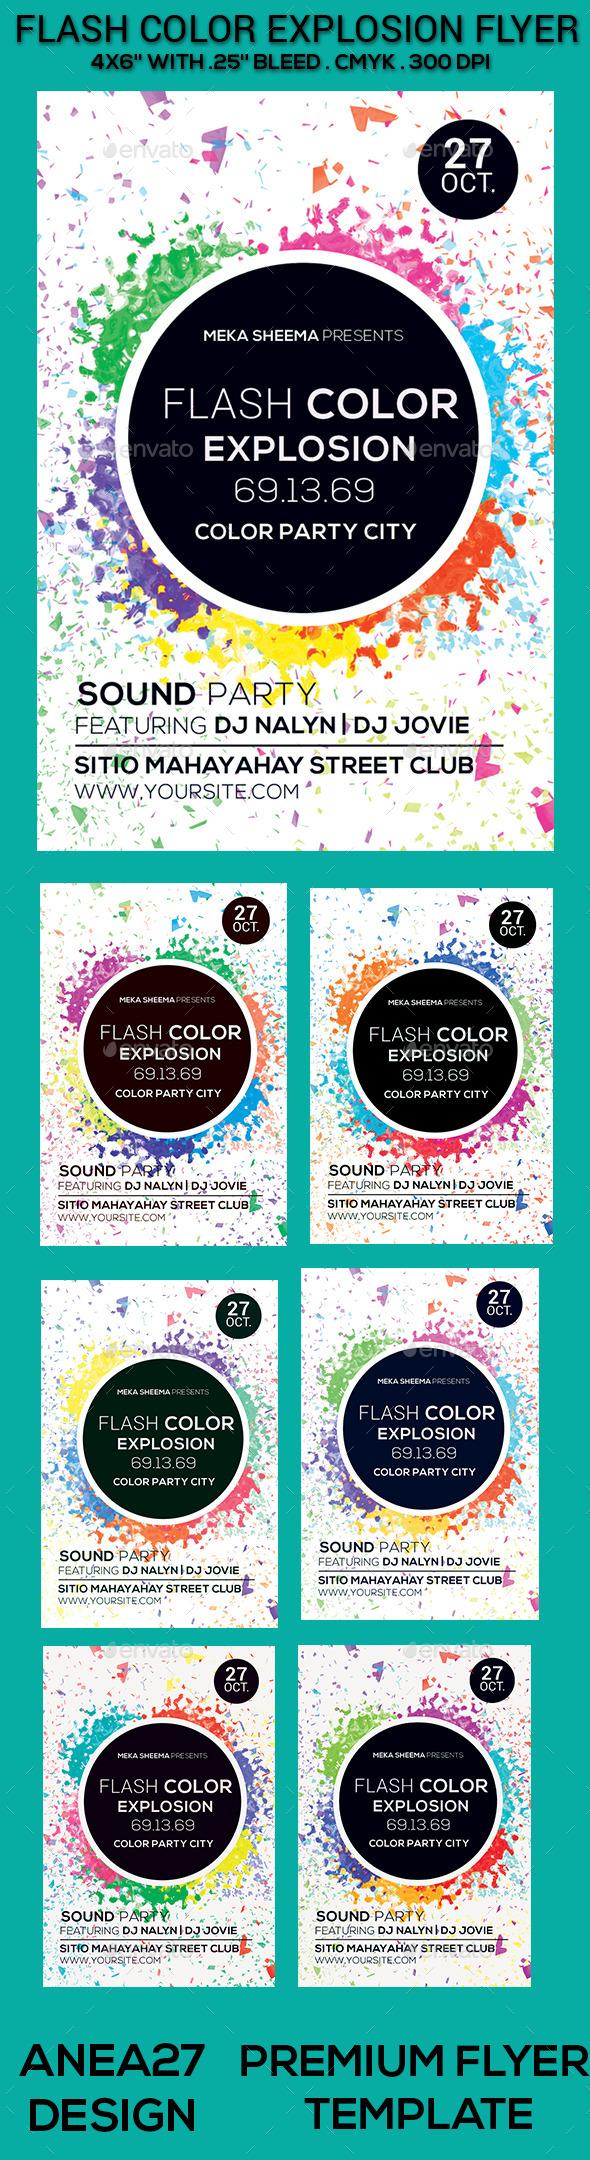 GraphicRiver Flash Color Explosion Flyer 9647864